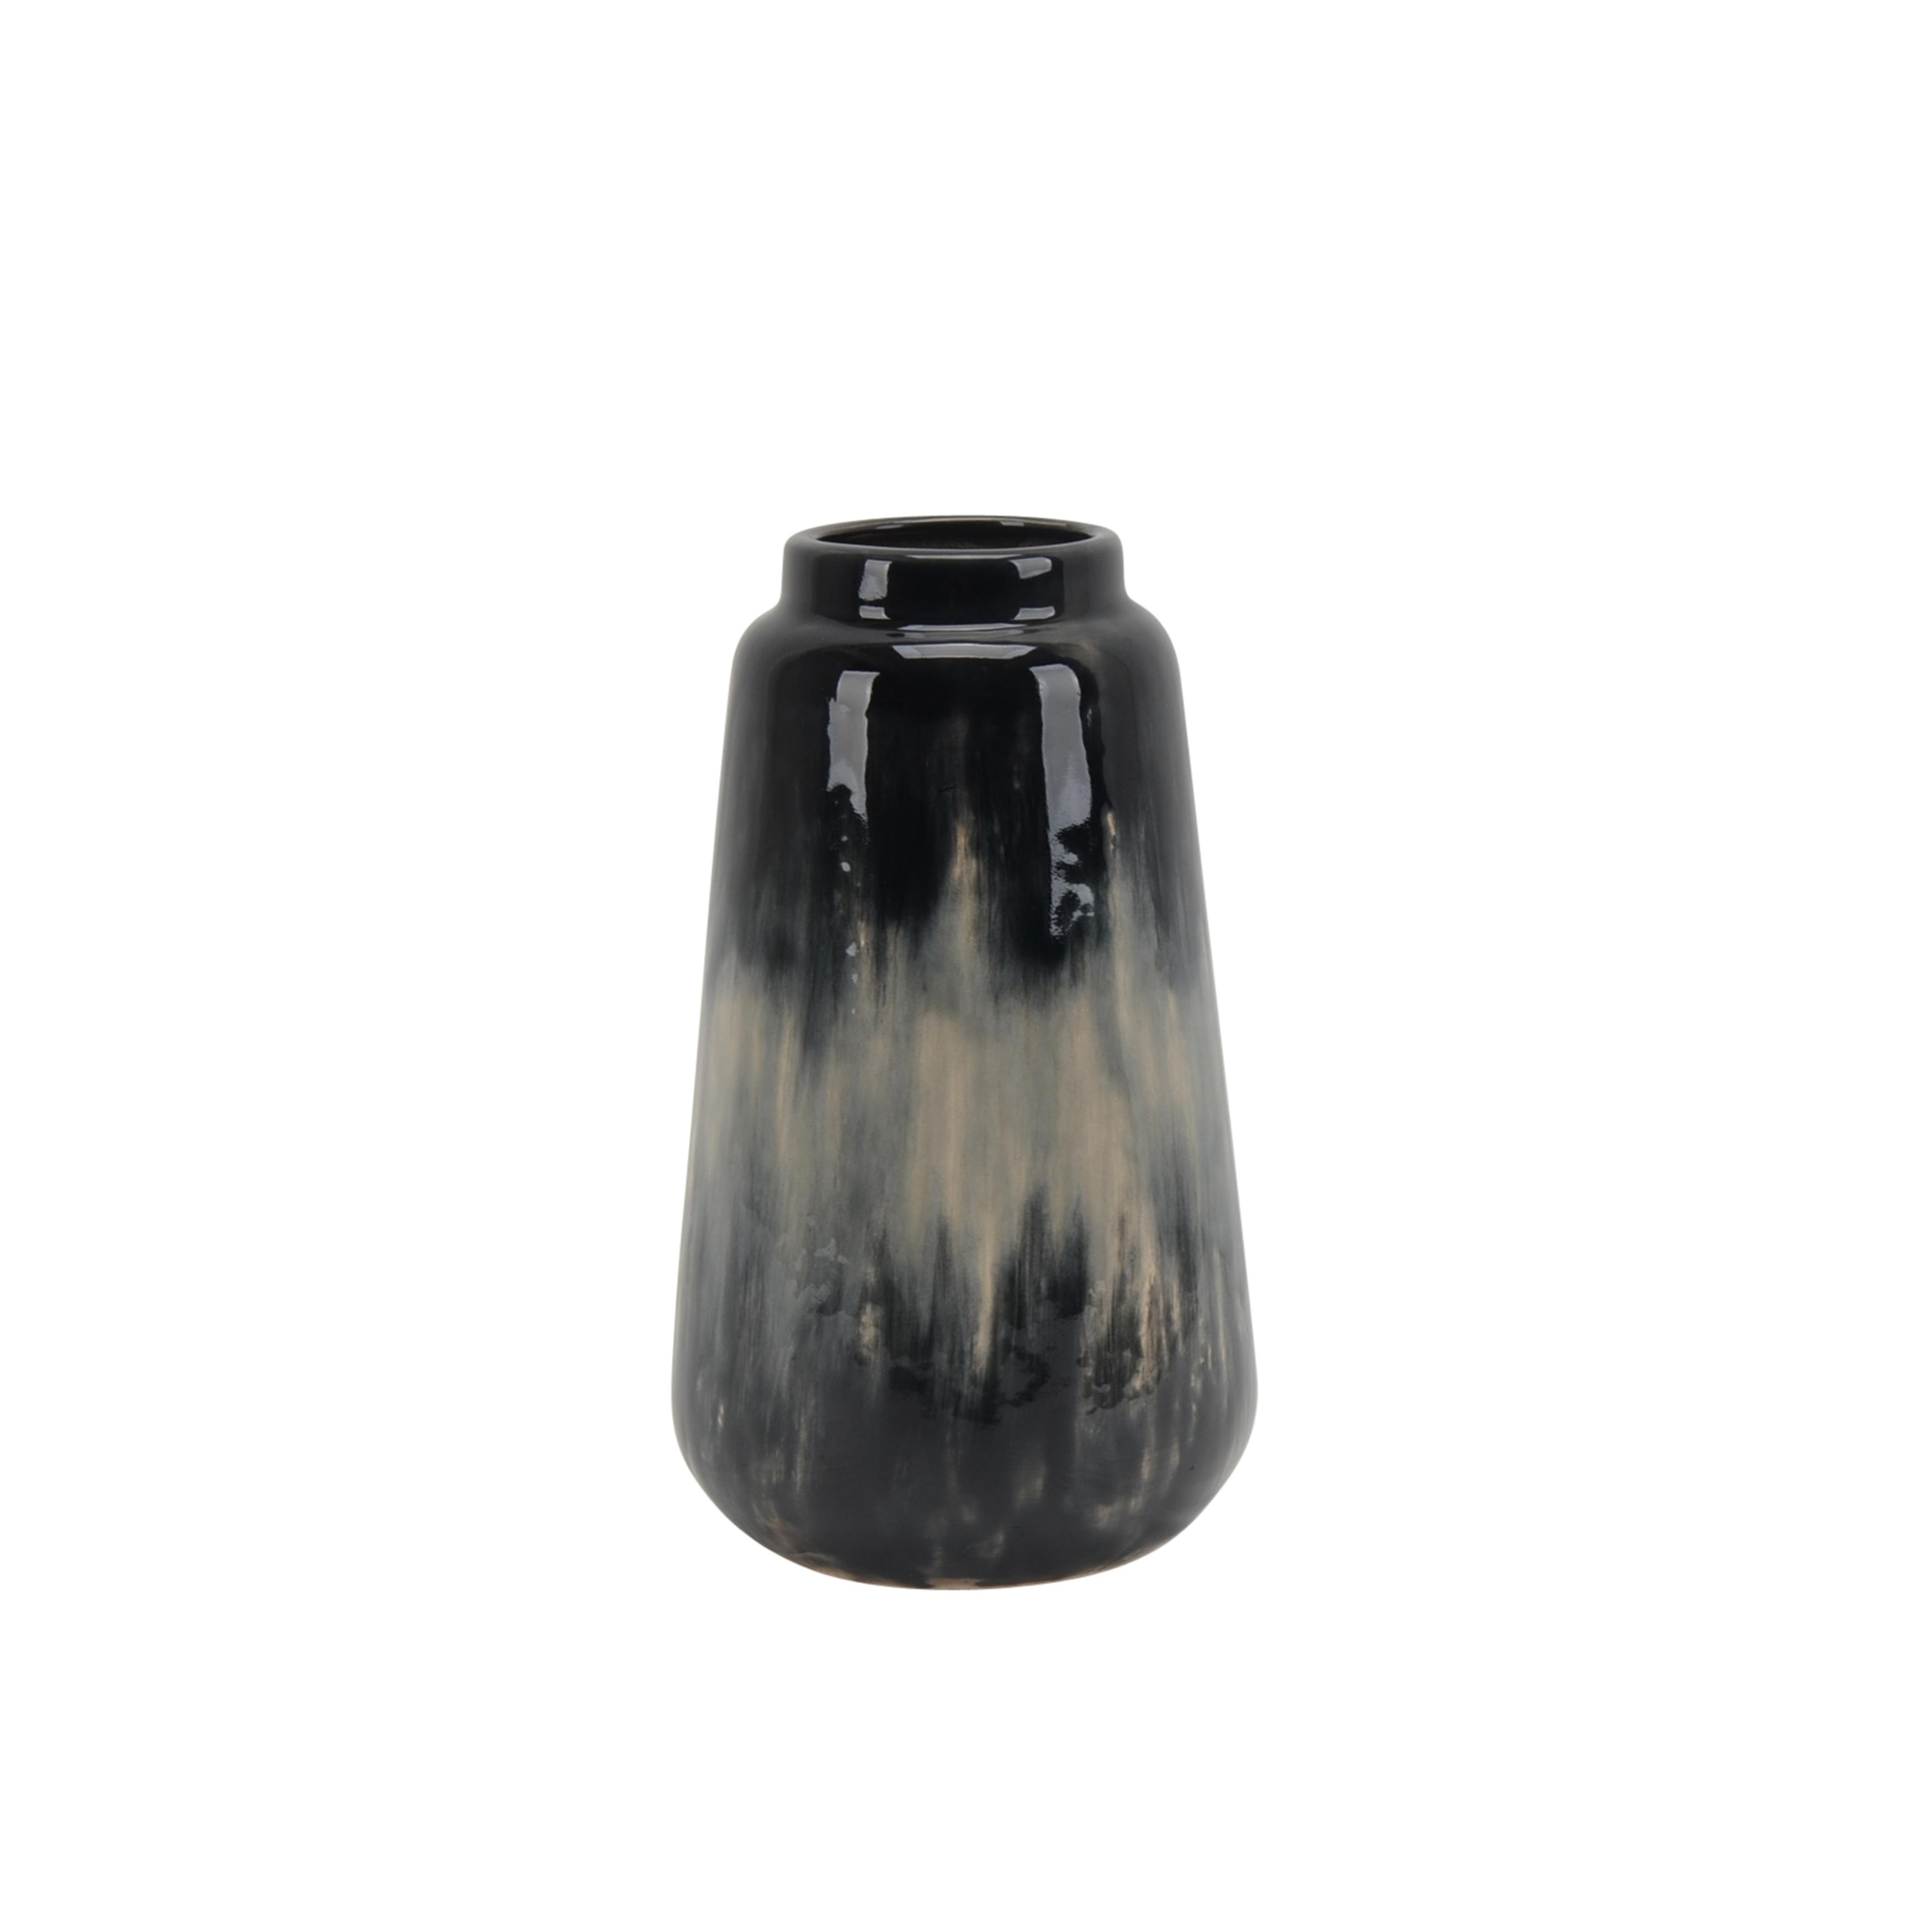 Textured Decorative Ceramic Vase with Round Opening, Black and Beige